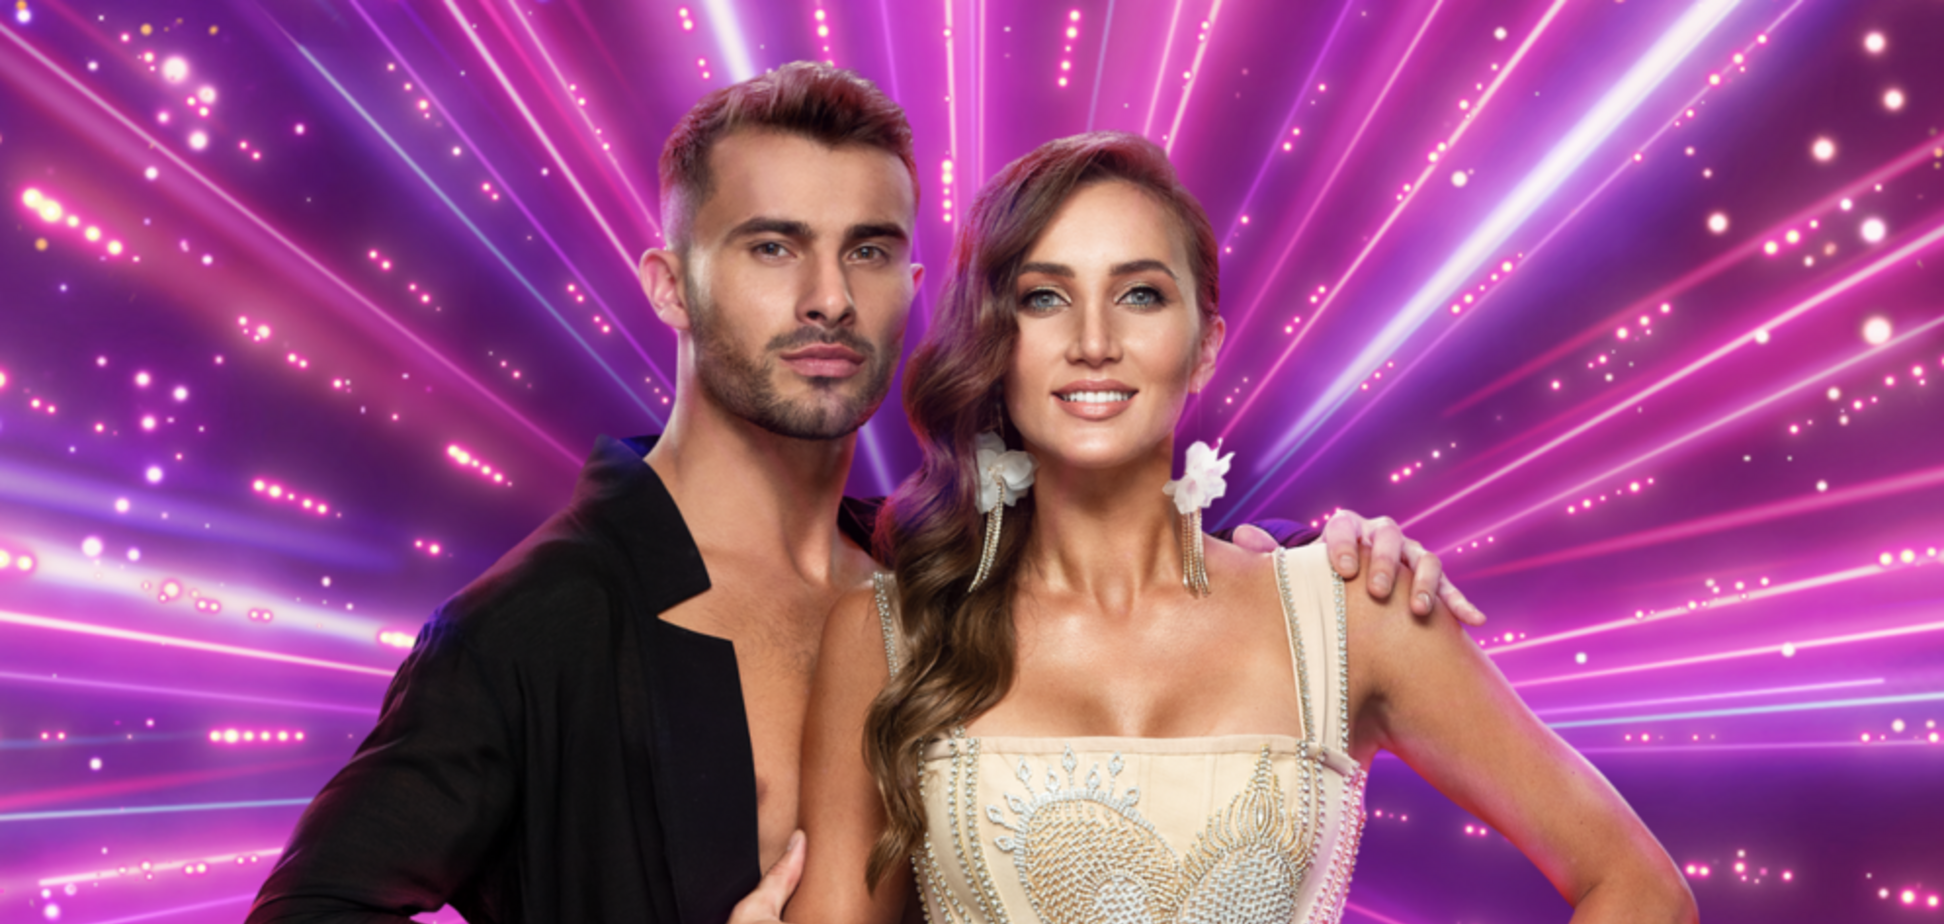 Финалистка 'Танців з зірками' Ризатдинова: кто она и как боролась в шоу